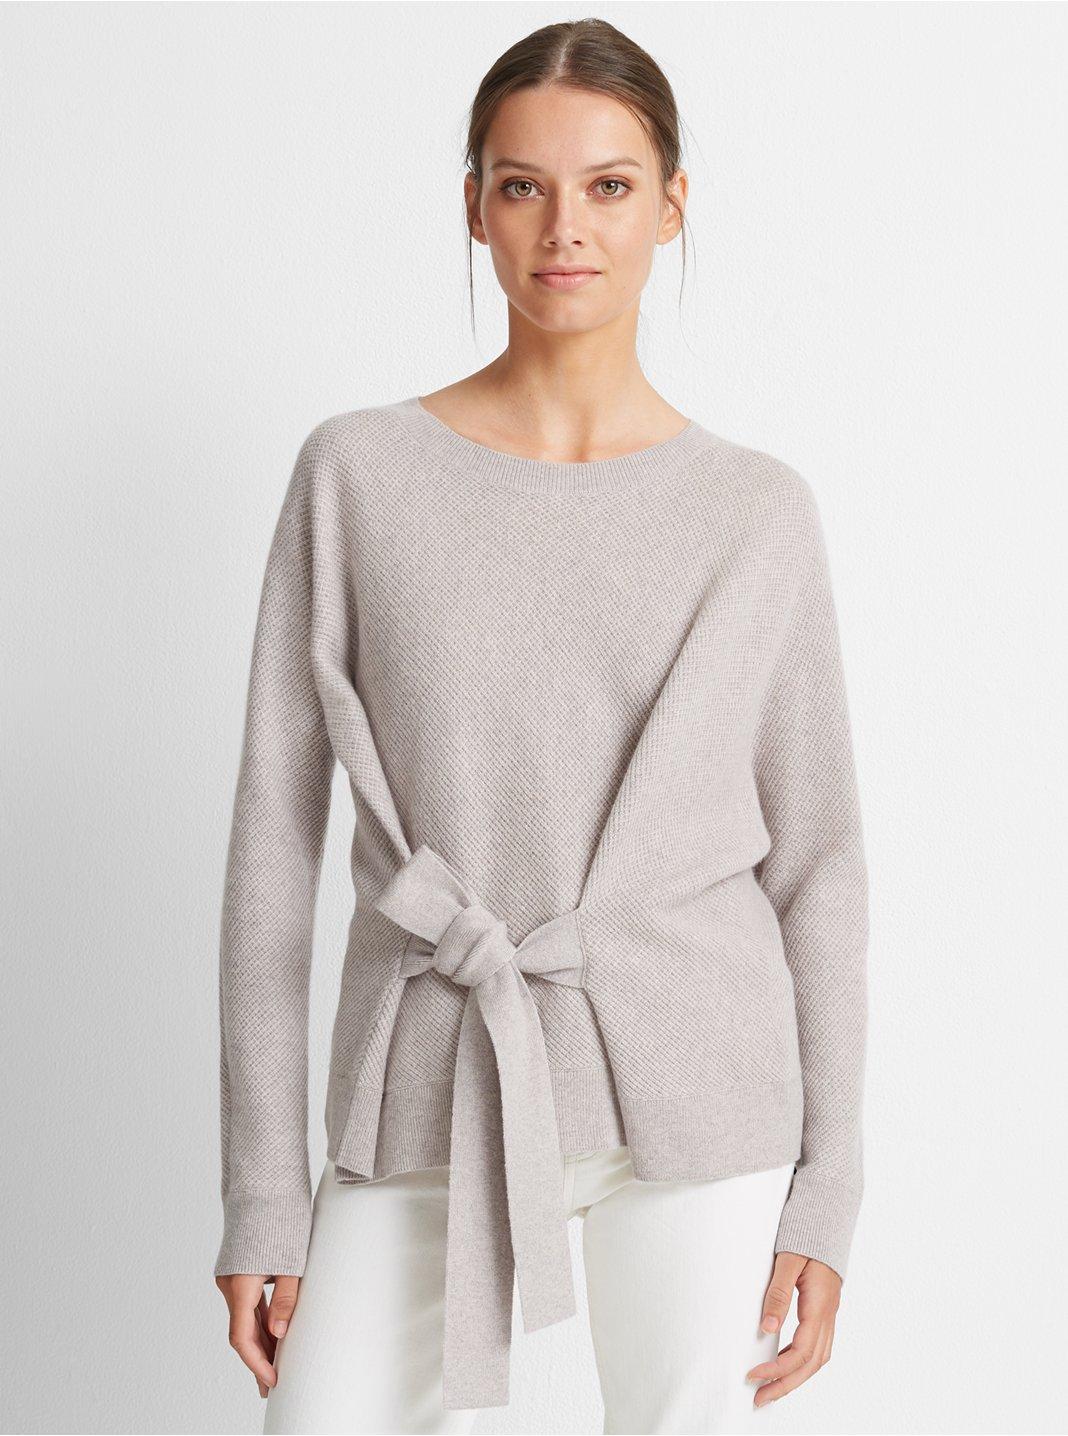 Kella Cashmere Sweater